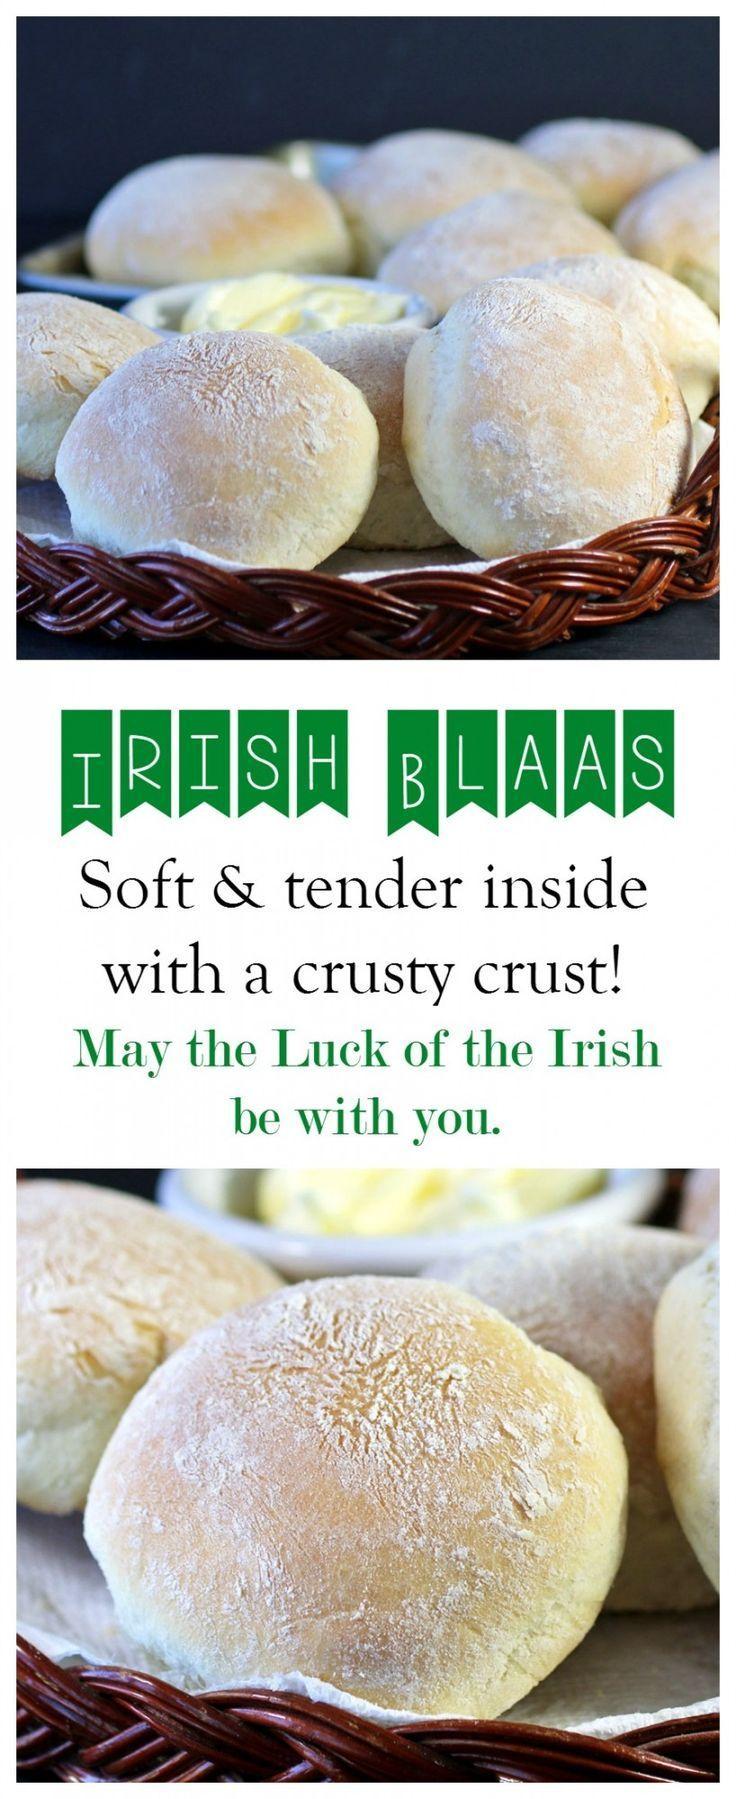 Irish Blaas! Blah Blah…Lisa Reiss